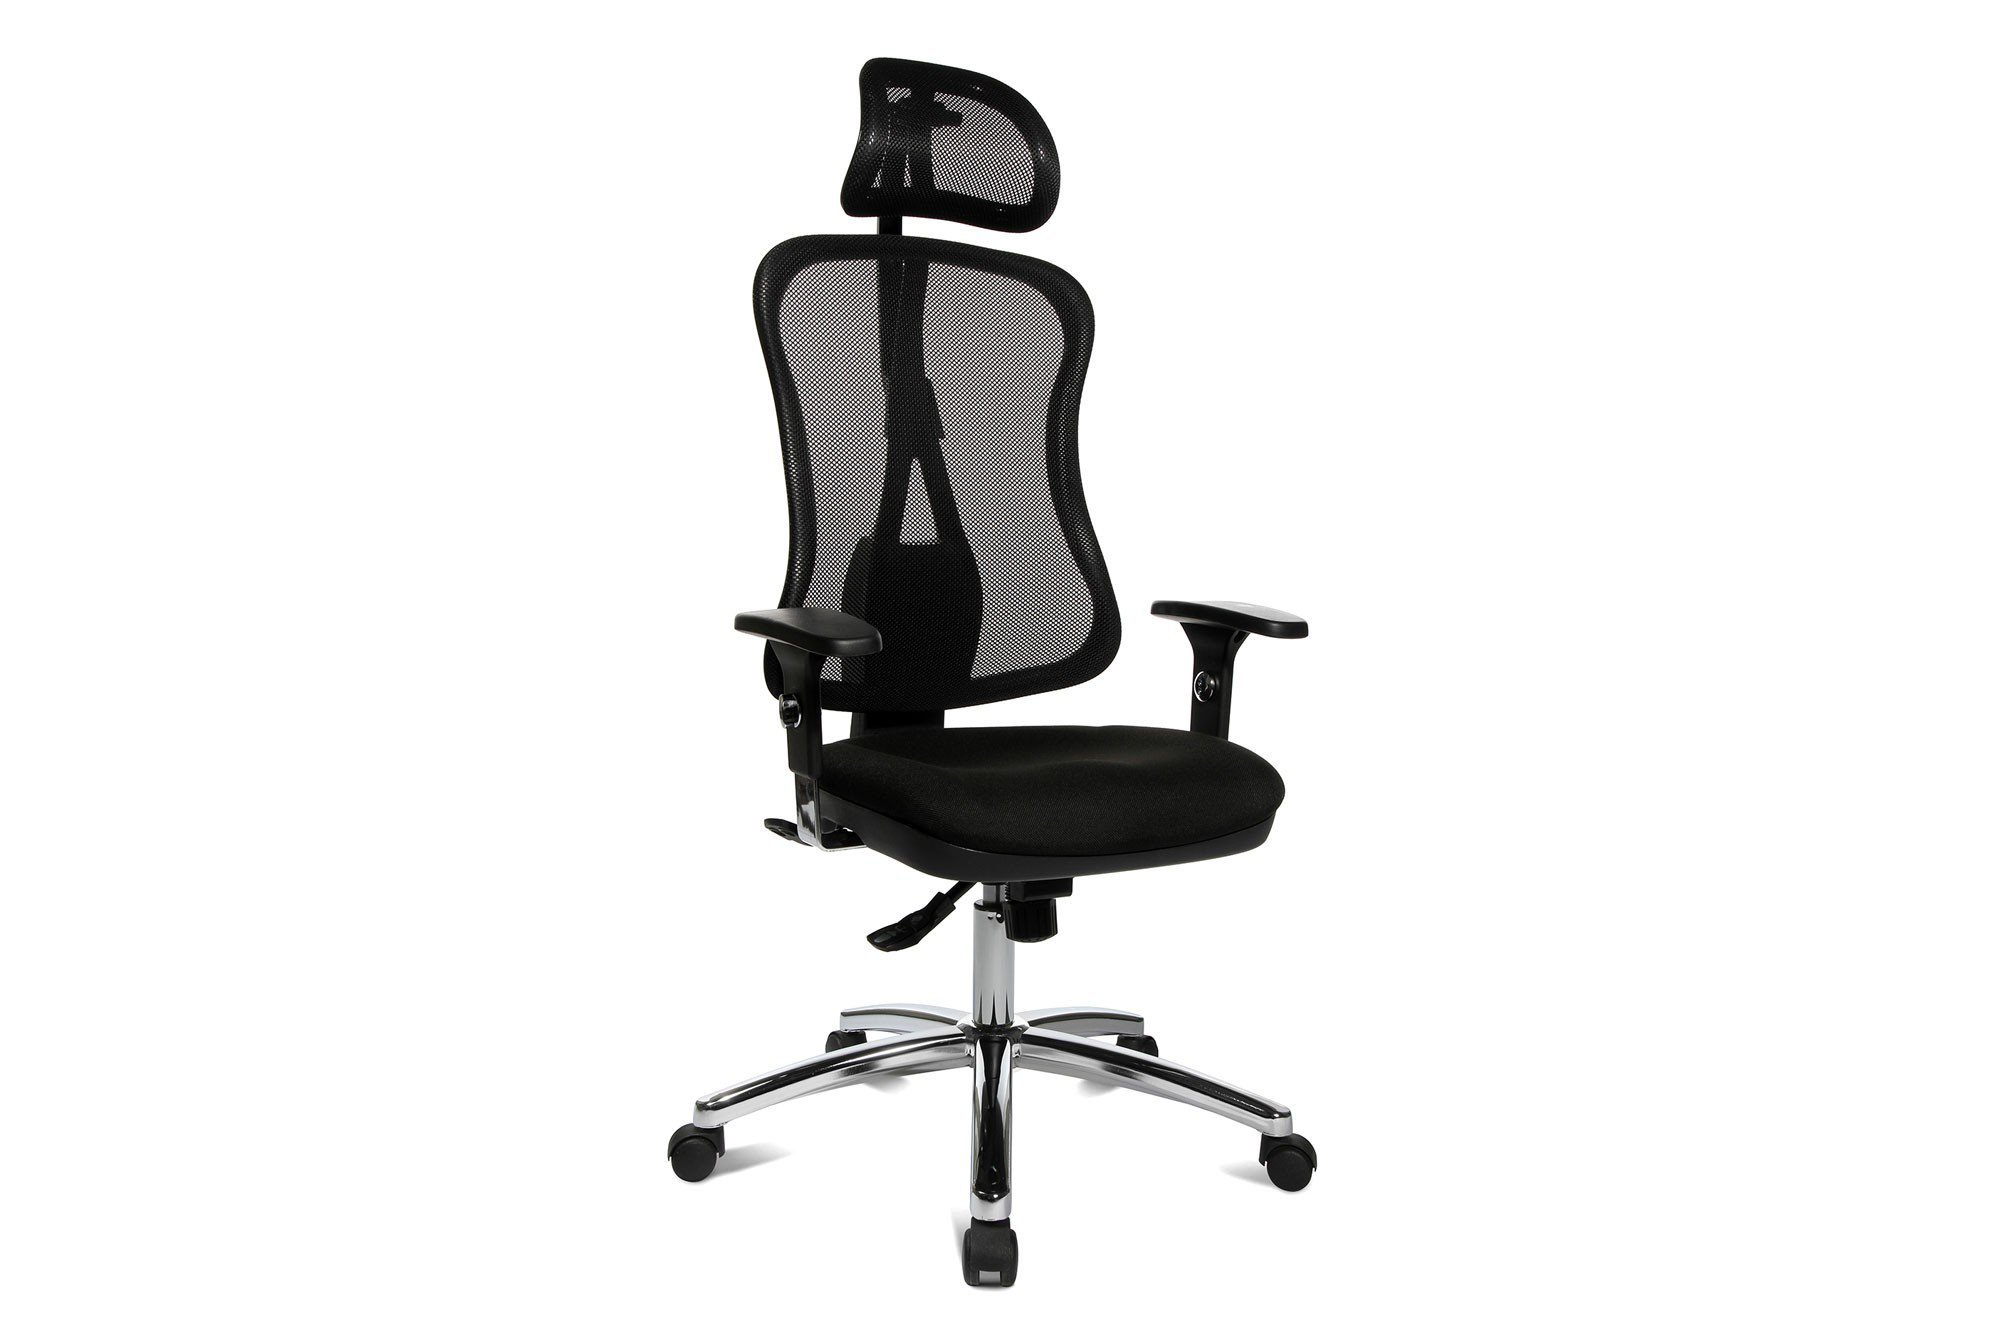 Topstar Drehstuhl Linea 45 schwarz   Möbel Letz - Ihr Online-Shop